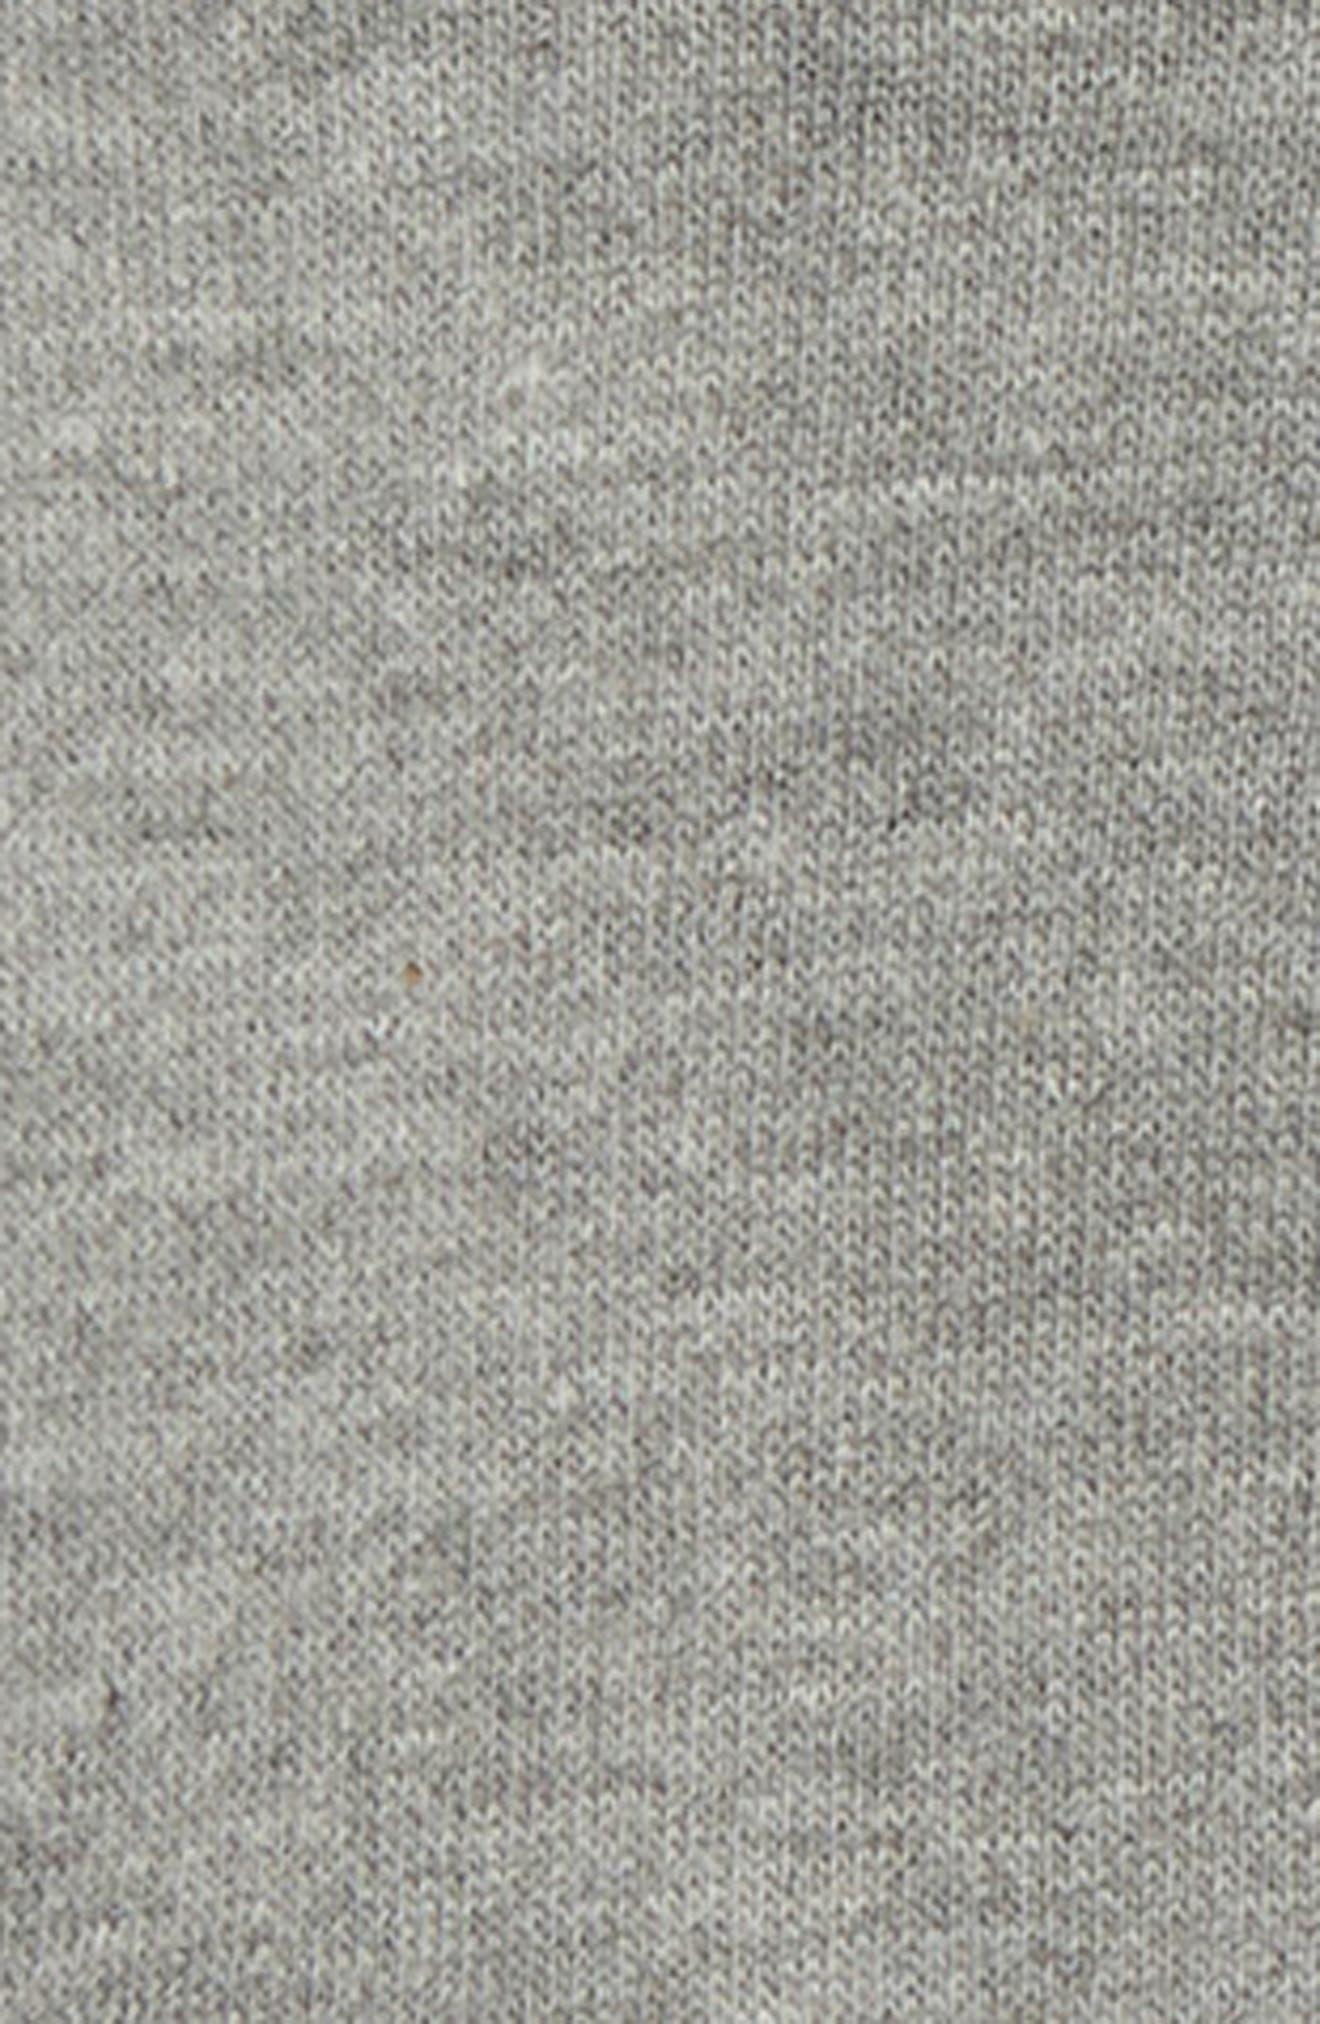 Air Hooded Fleece Romper,                             Alternate thumbnail 2, color,                             DK GREY HEATHER